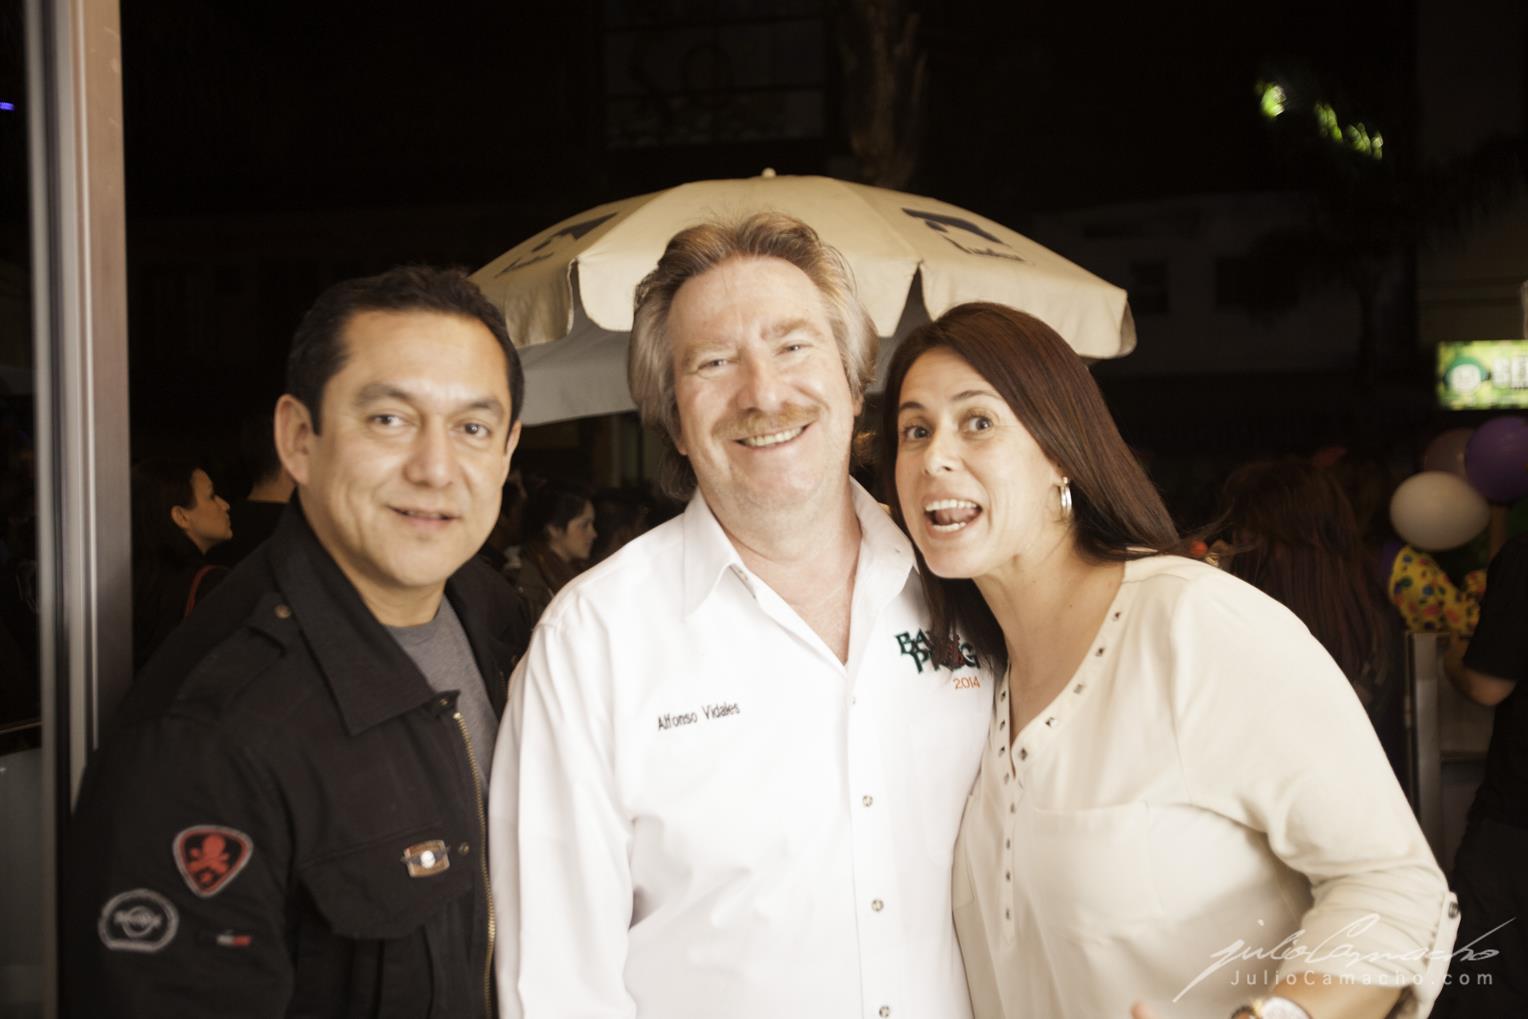 2014-10-30 31 CAST TOUR Ensenada y Tijuana - 1899 - www.Juli (Copy).jpg